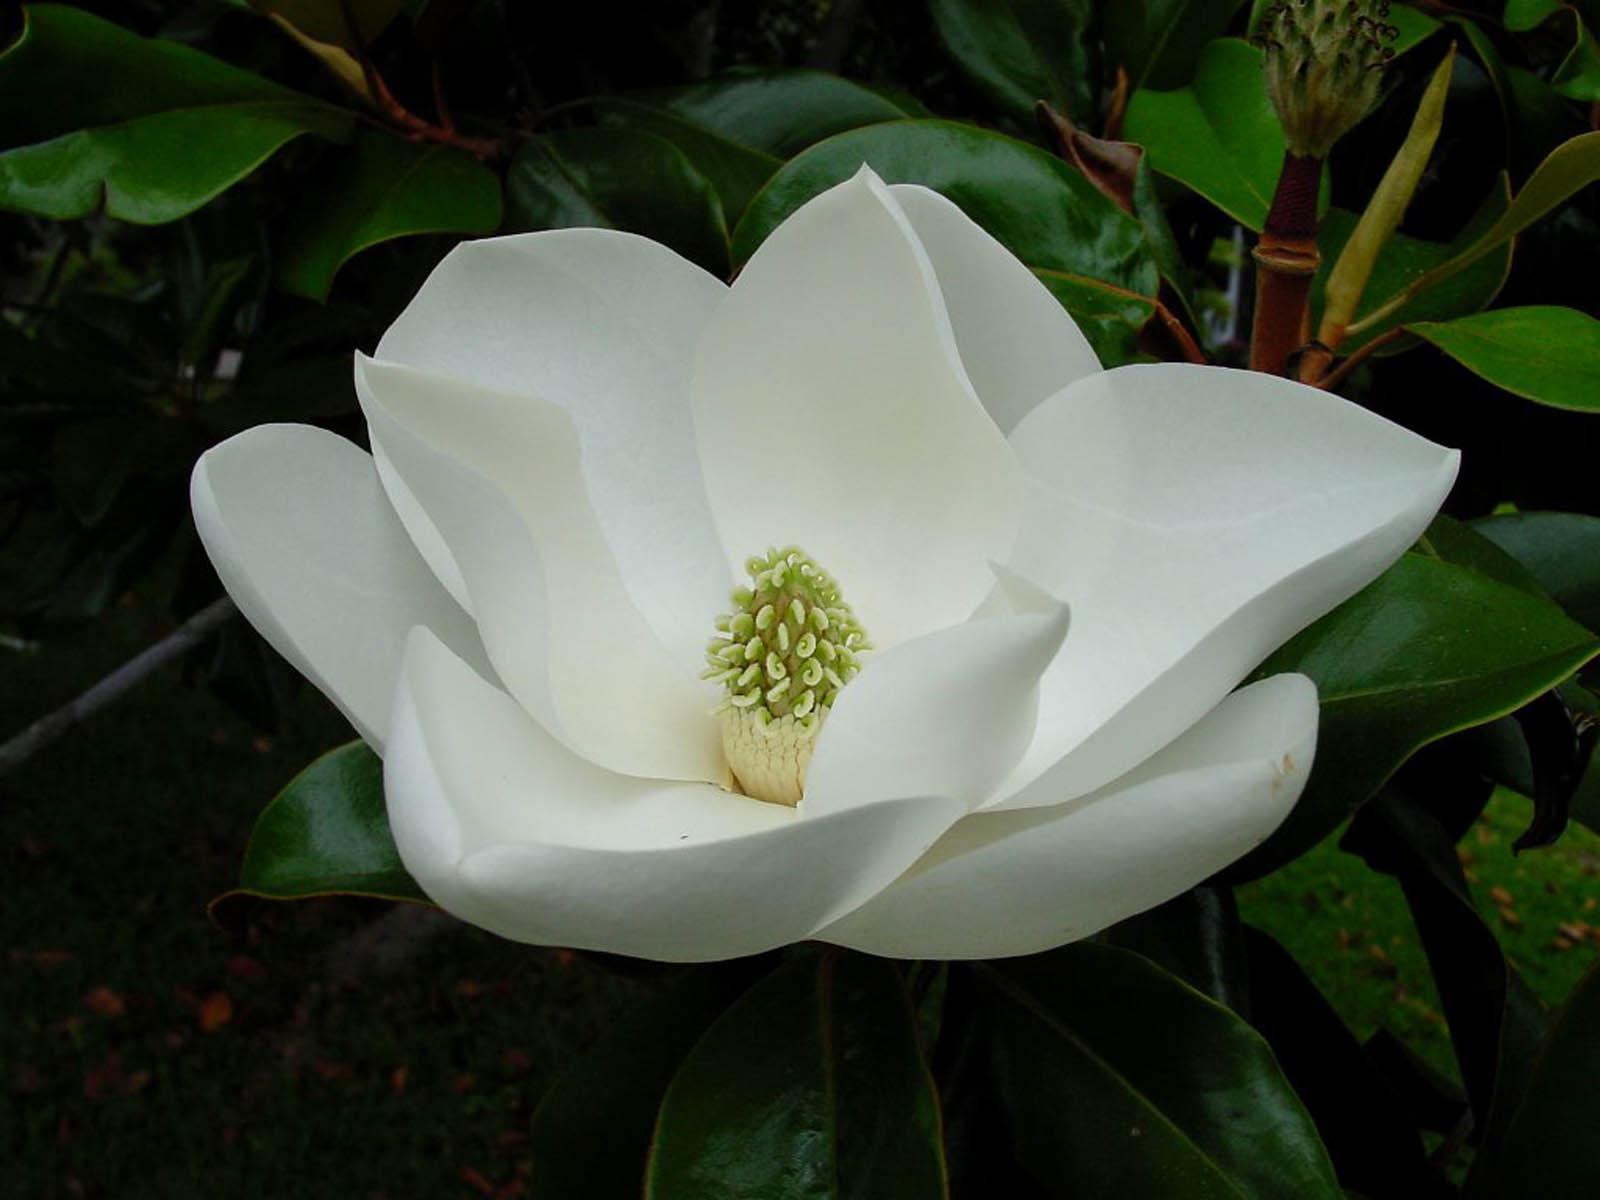 wallpaper: Magnolia Blossom